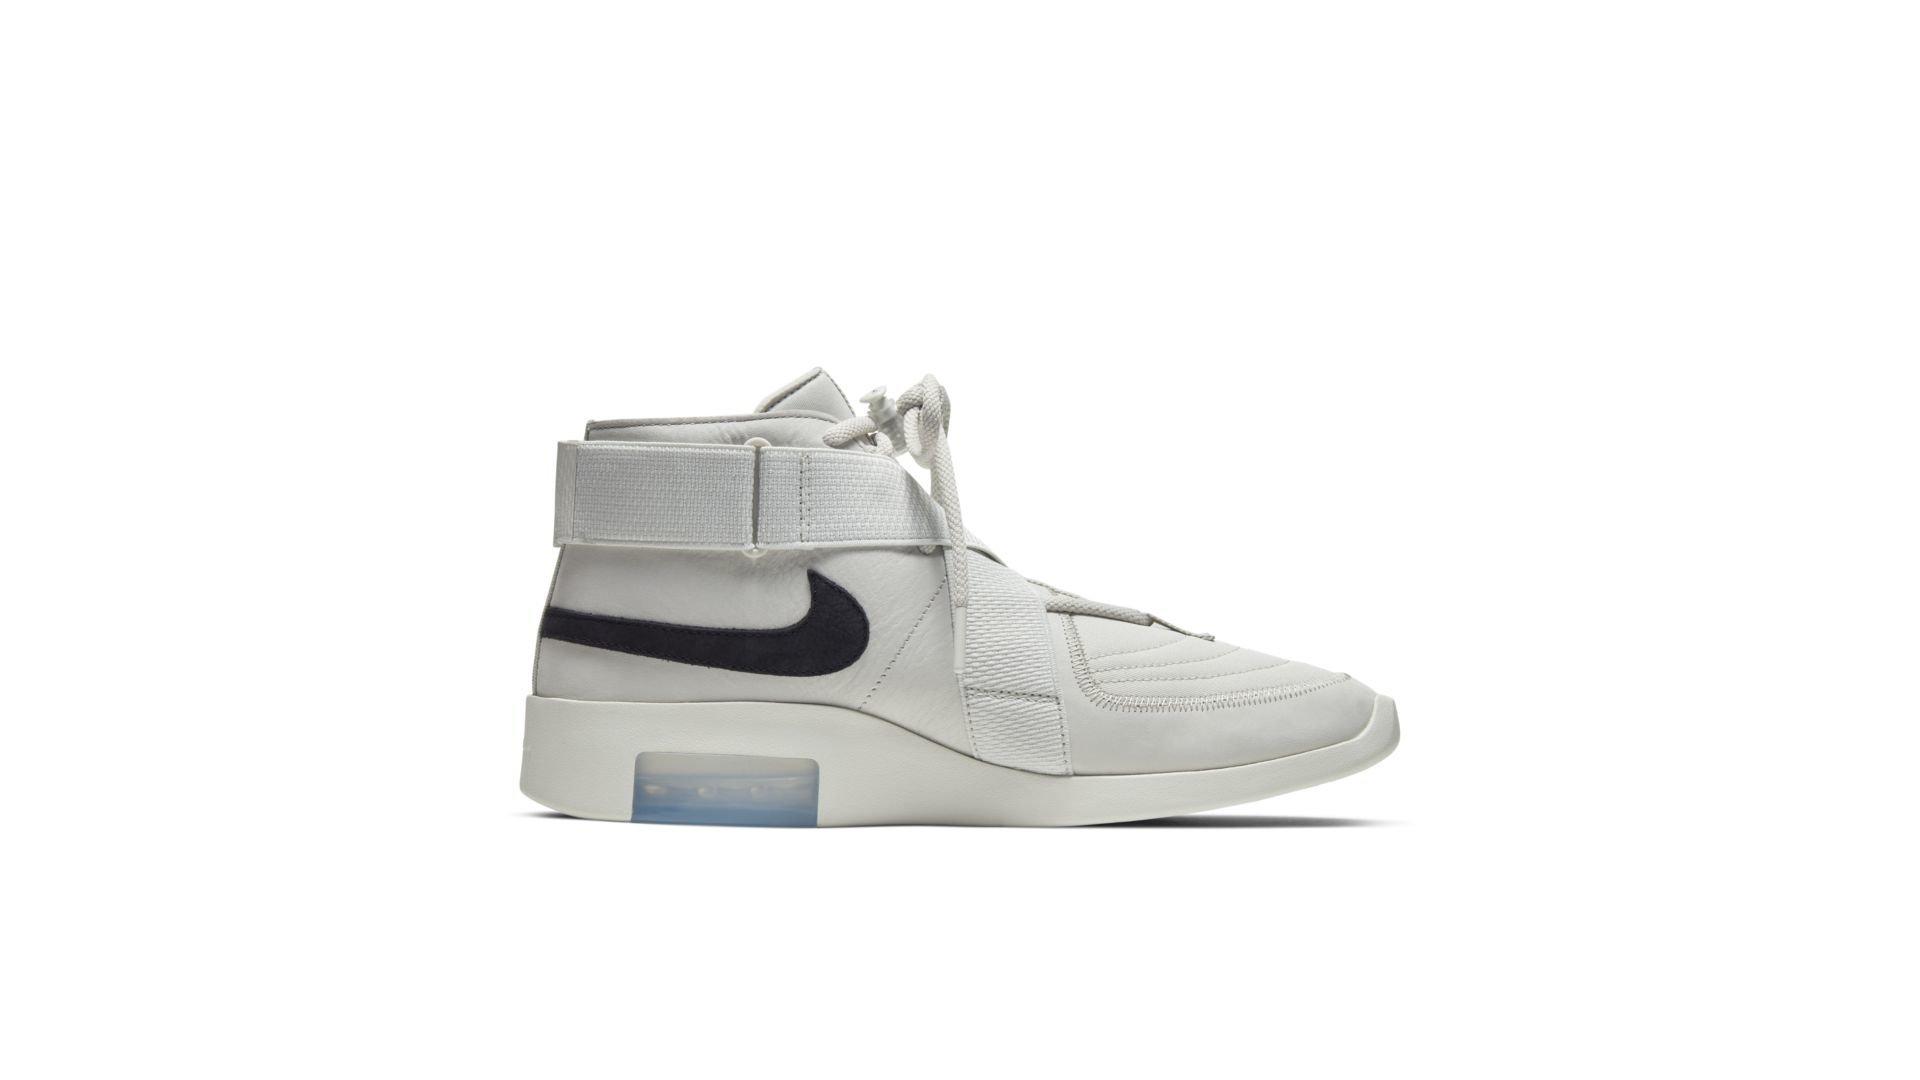 Nike Air Fear Of God 180 'Light Bone' (AT8087-001)